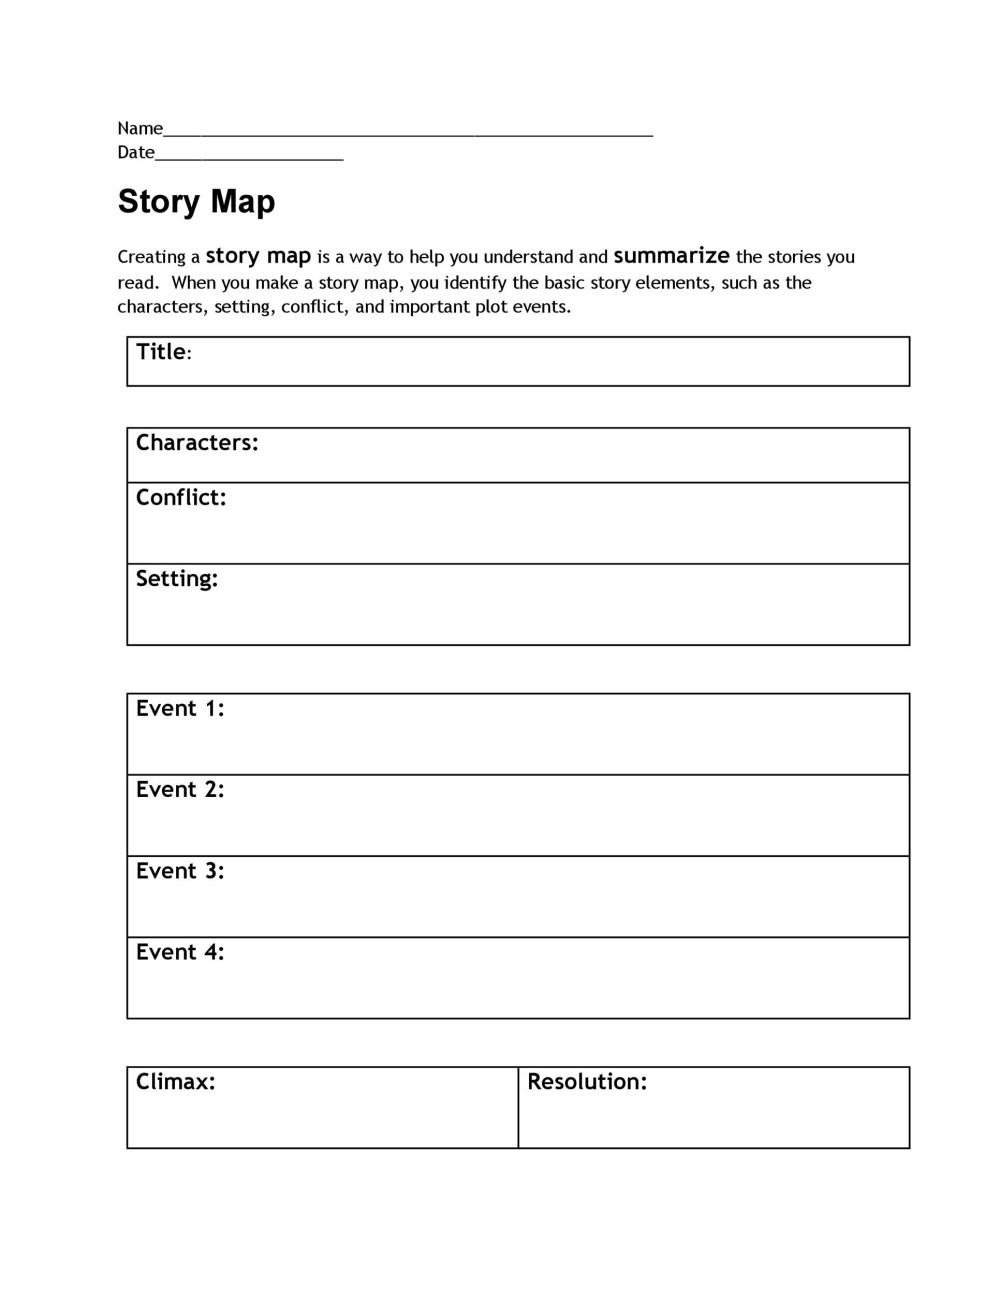 medium resolution of 41 Free \u0026 Printable Story Map Templates PDF / Word ᐅ TemplateLab